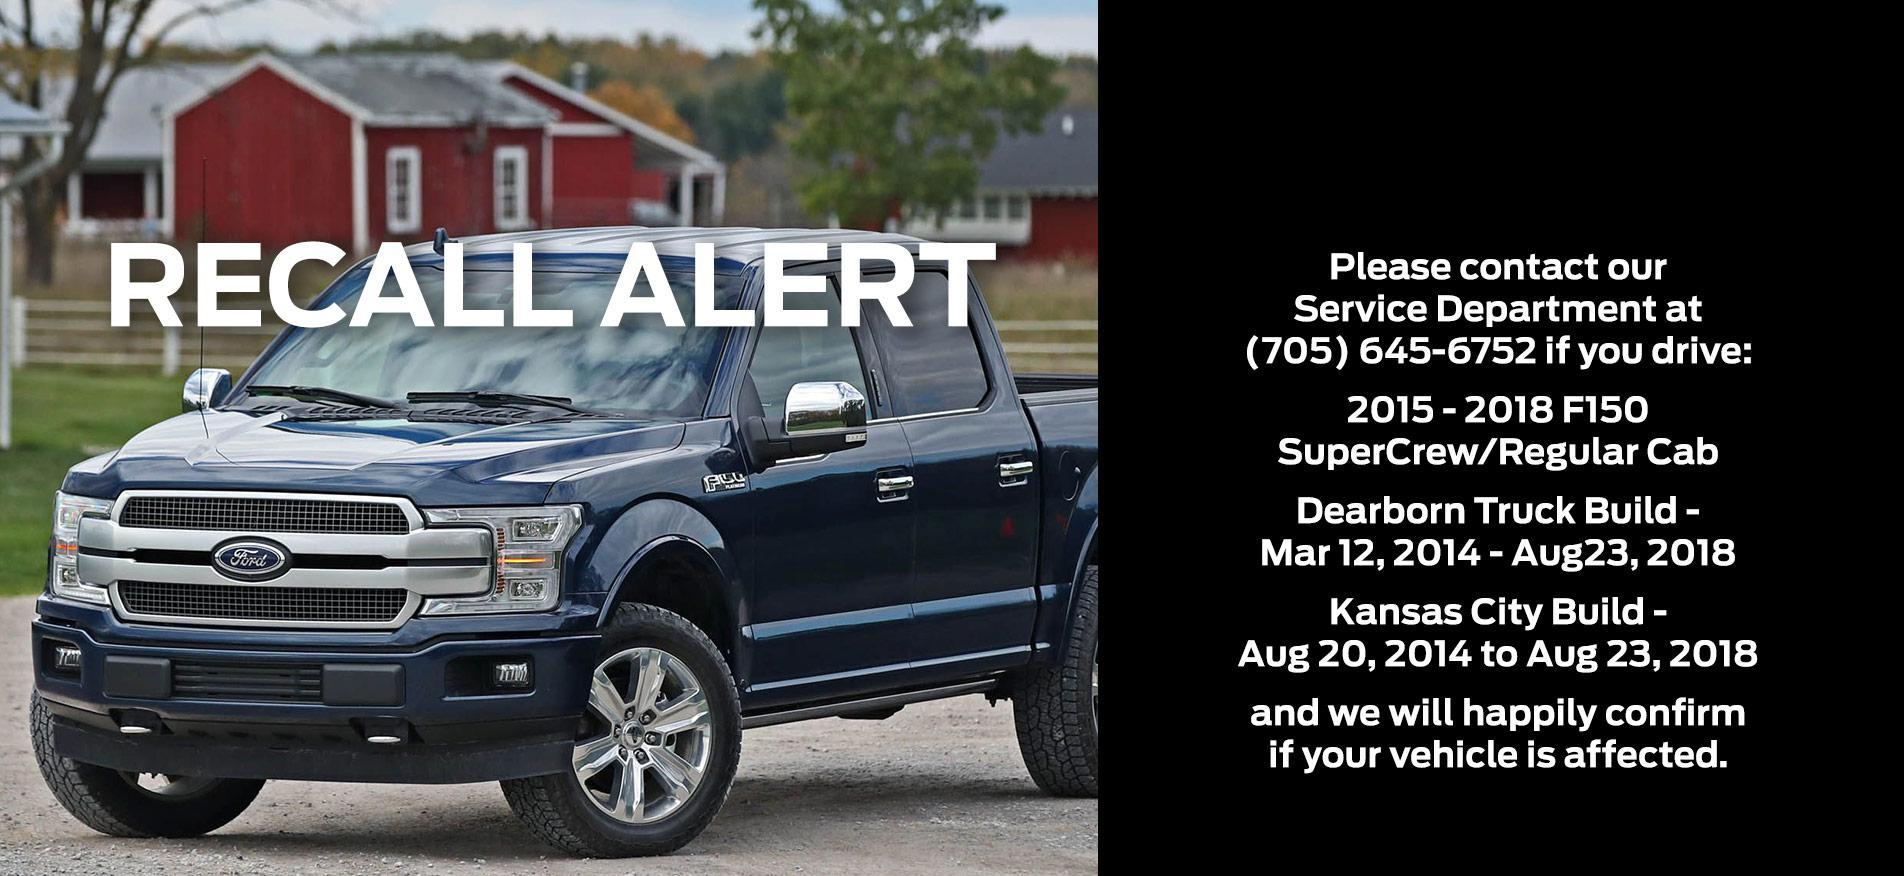 Cavalcade Ford - Recall Alert